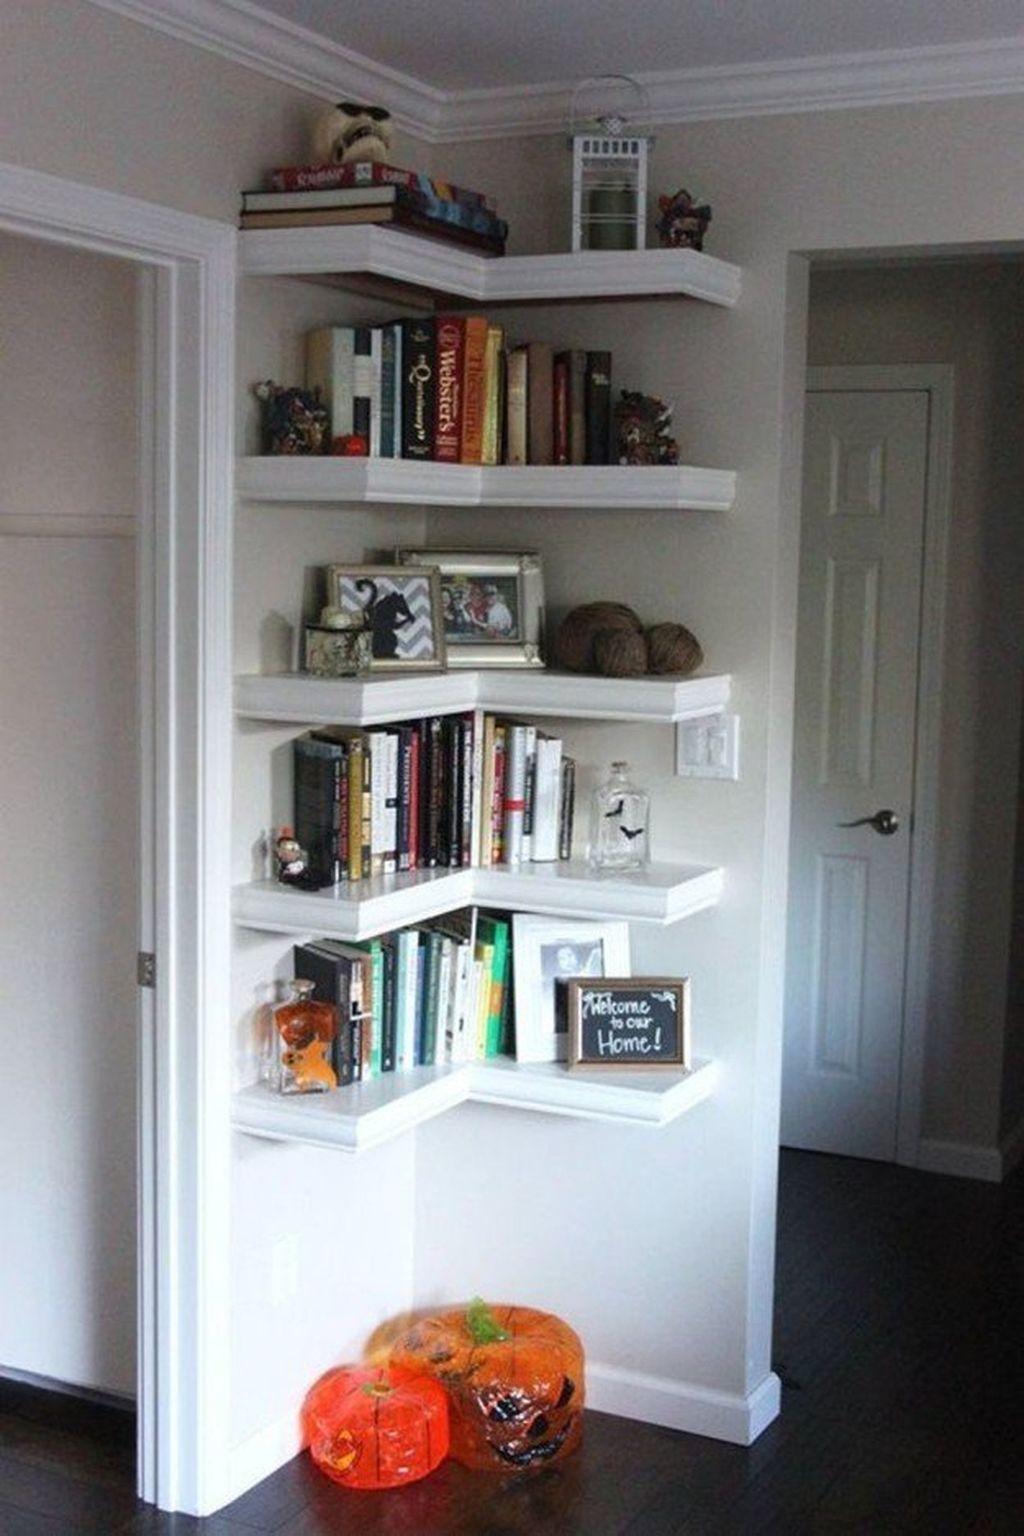 74 brilliant bookshelf design ideas for small space you will